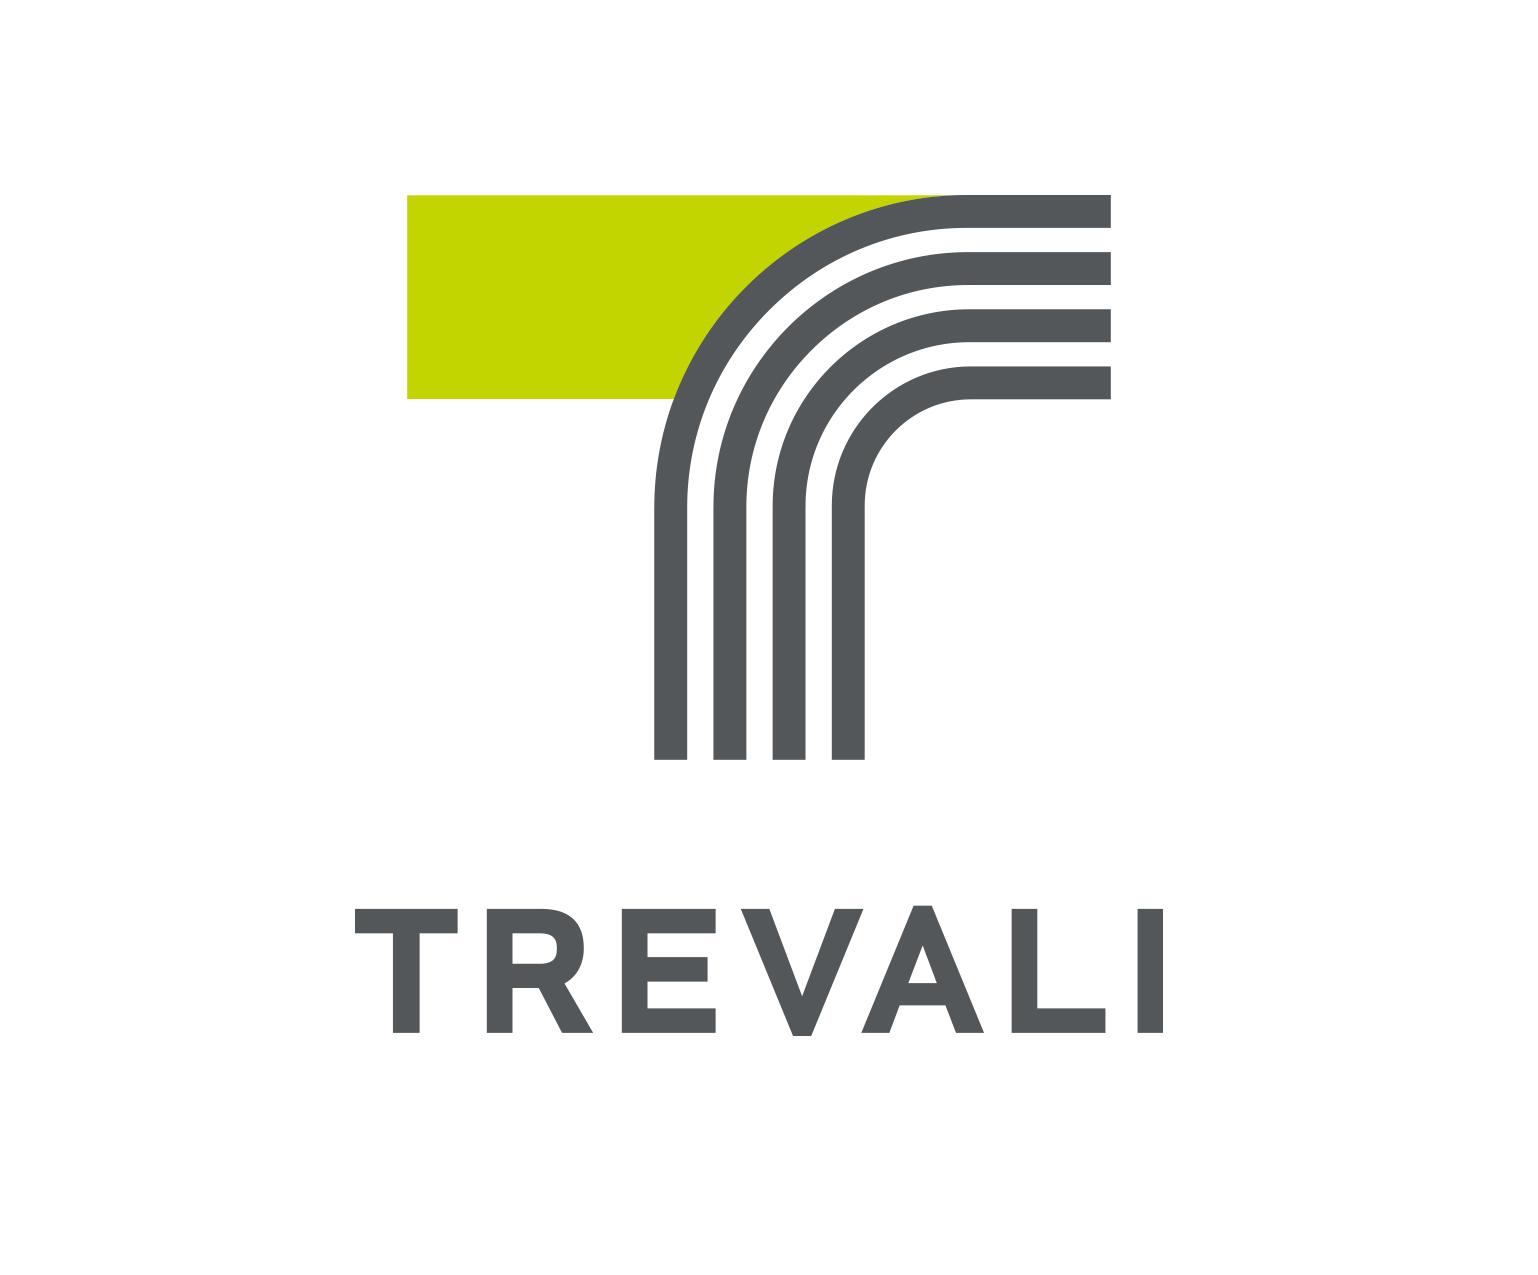 Trevali Reports 2019 Sustainability Performance